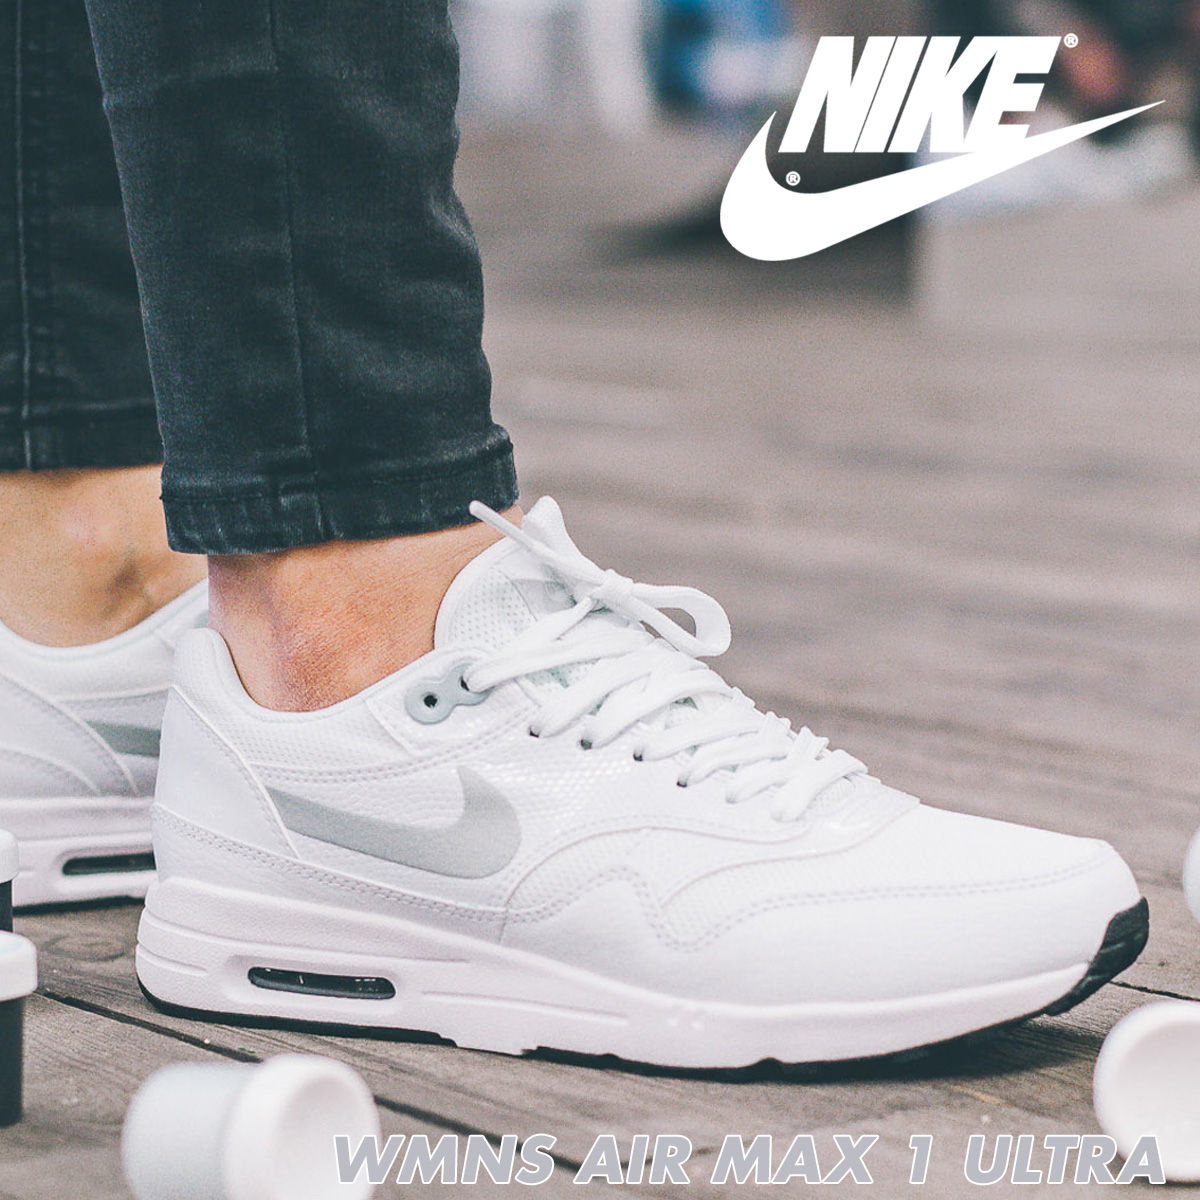 13 11 Size 7.5 UK Nike Wmns Air Max 1 Ultra 2.0 Womens gran